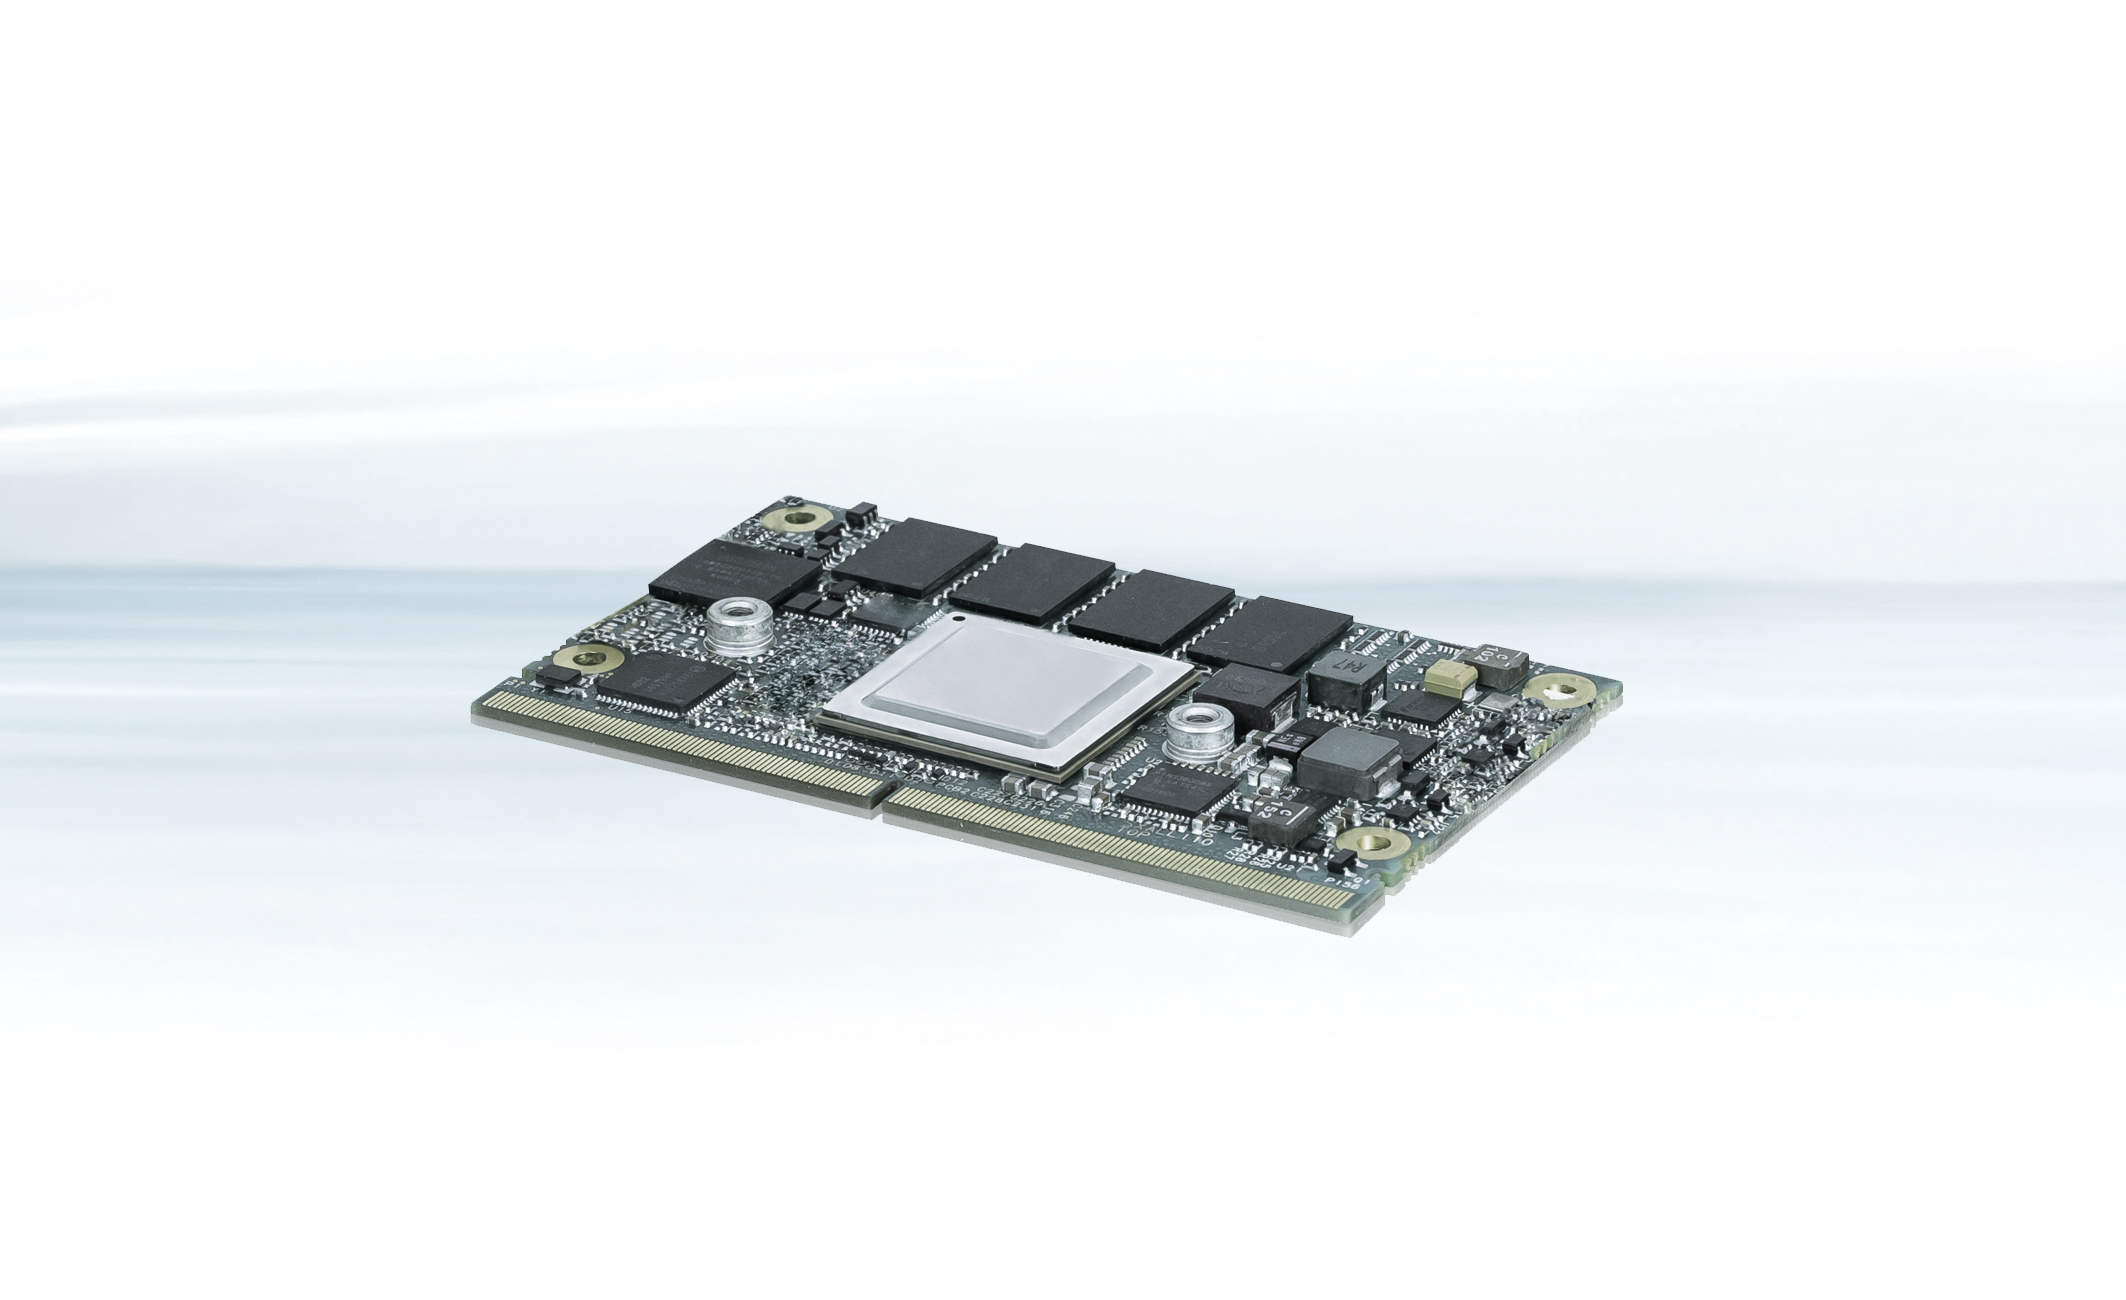 SMARC-sAL28 module runs Linux With Sensitive GbE ports